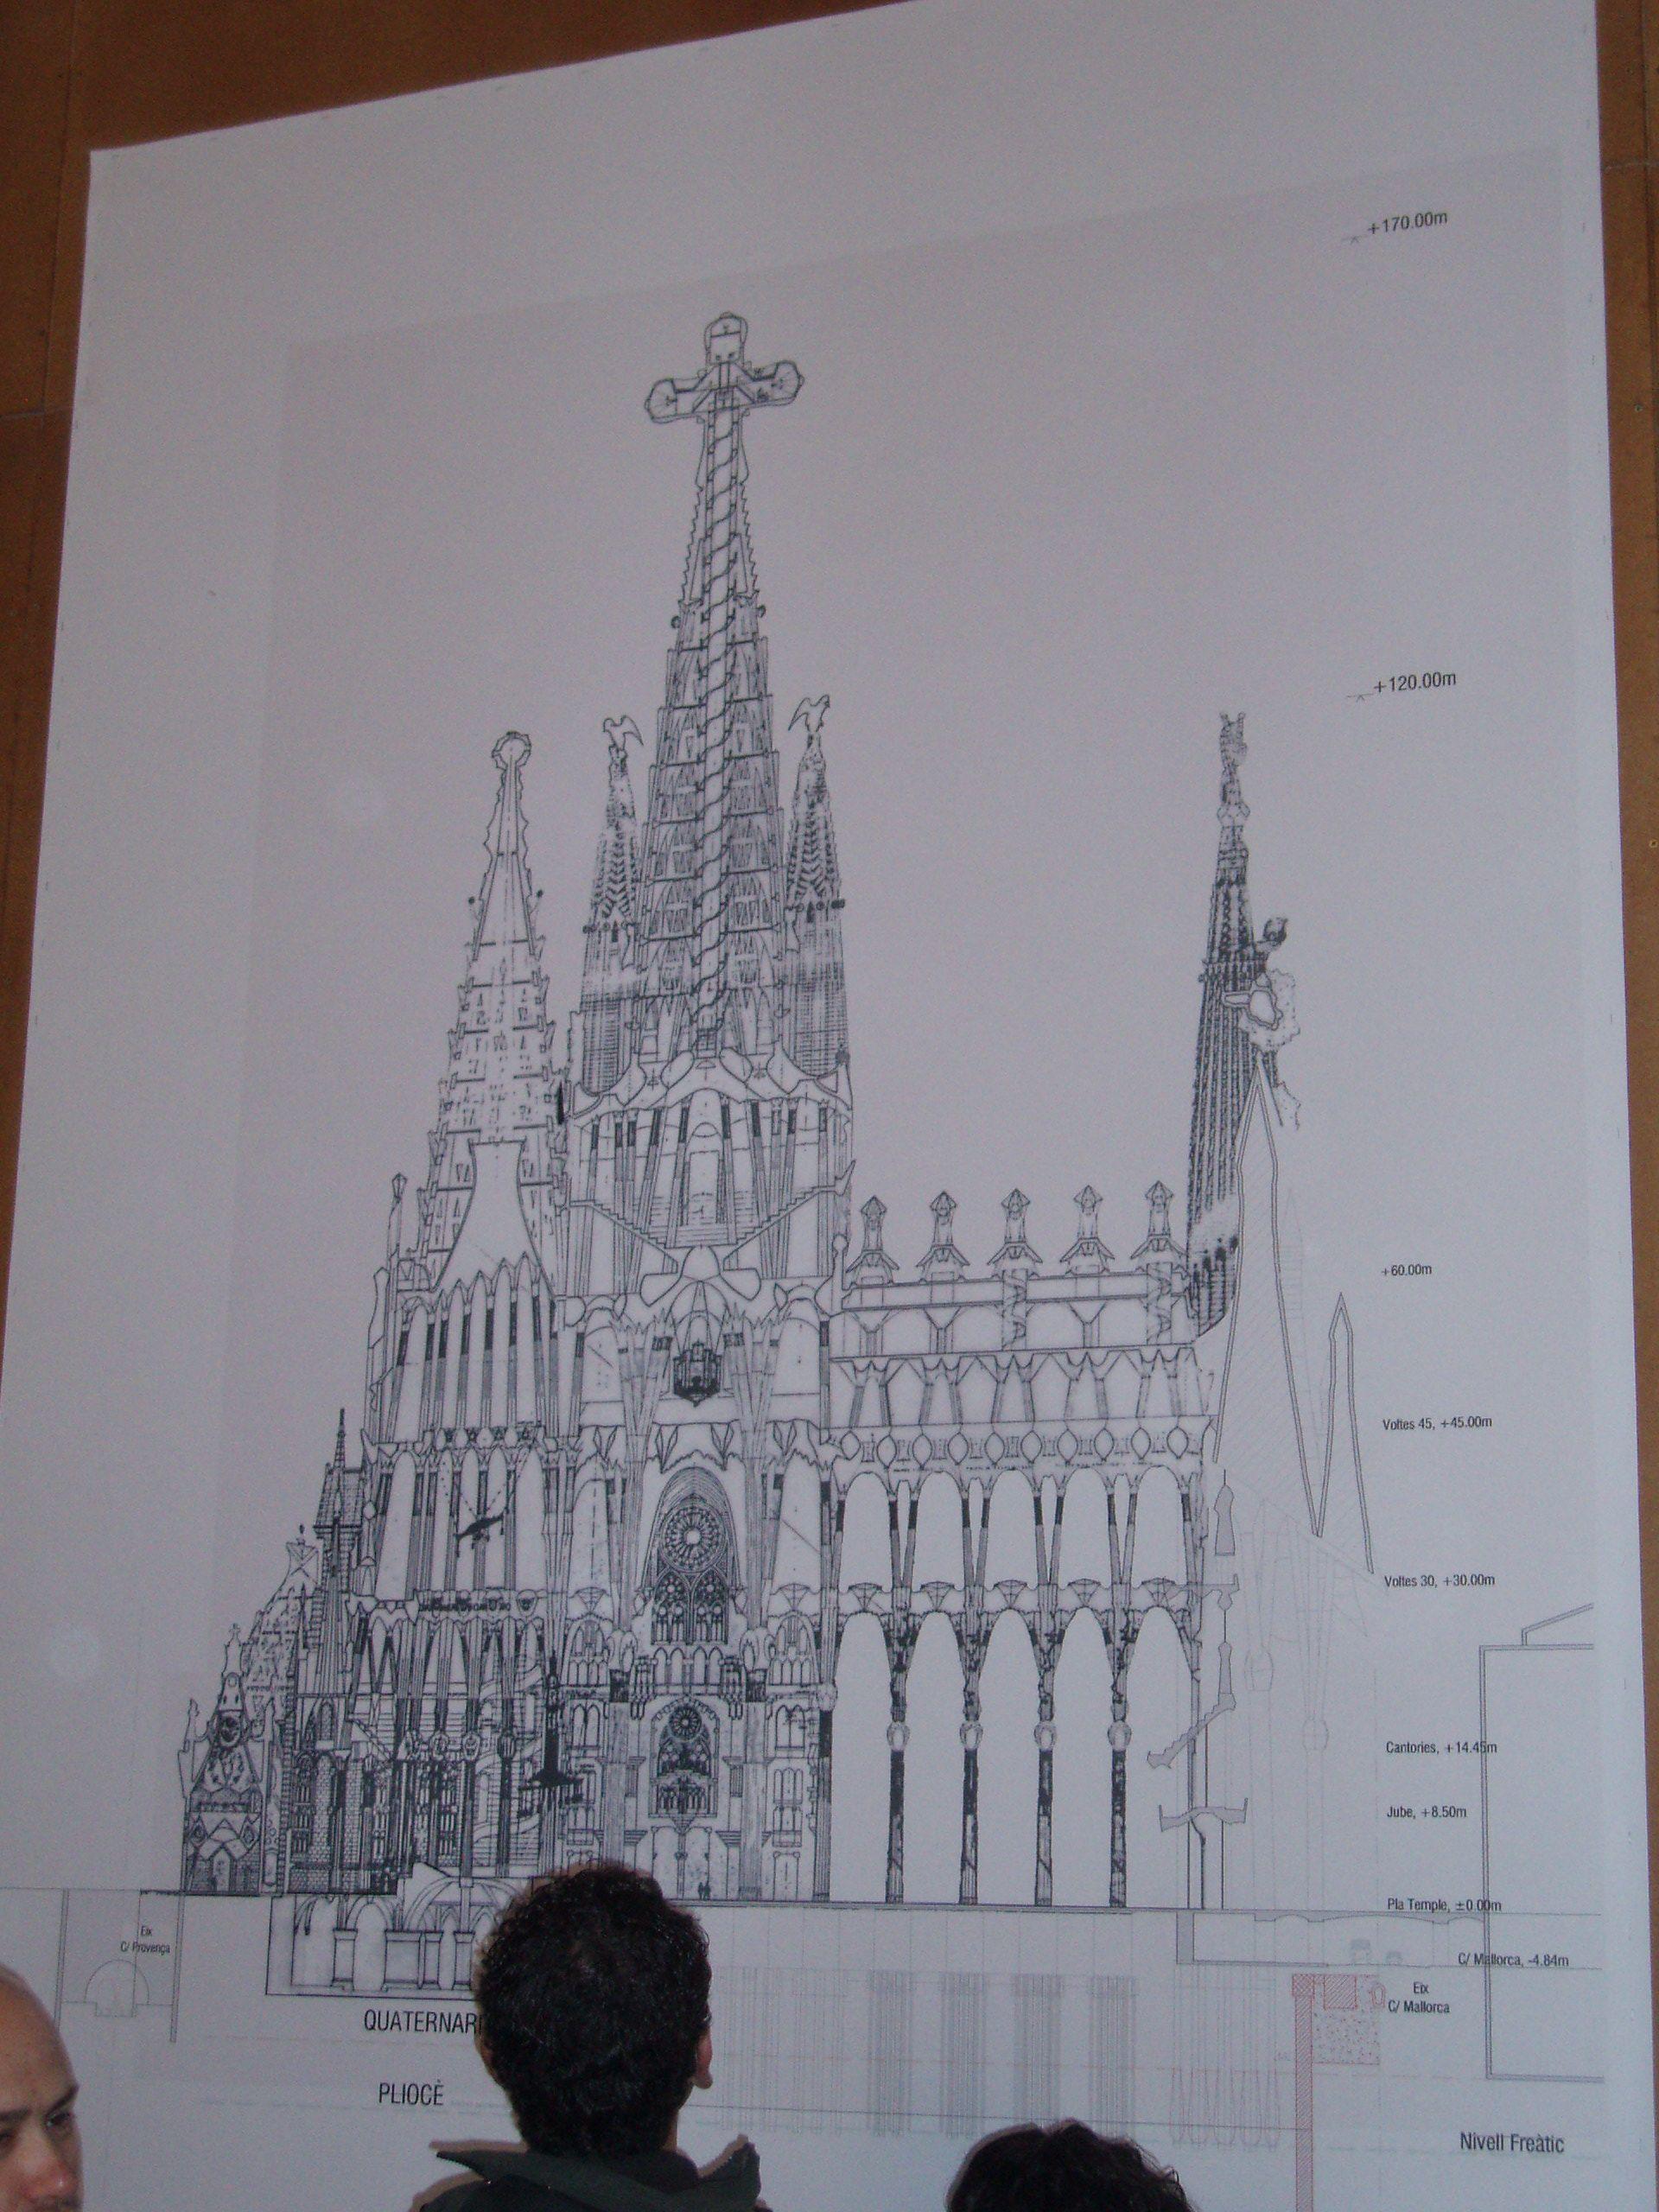 Blueprint of the sagrada familia barcelonaspain 27feb2012 blueprint of the sagrada familia barcelonaspain 27feb2012 malvernweather Images